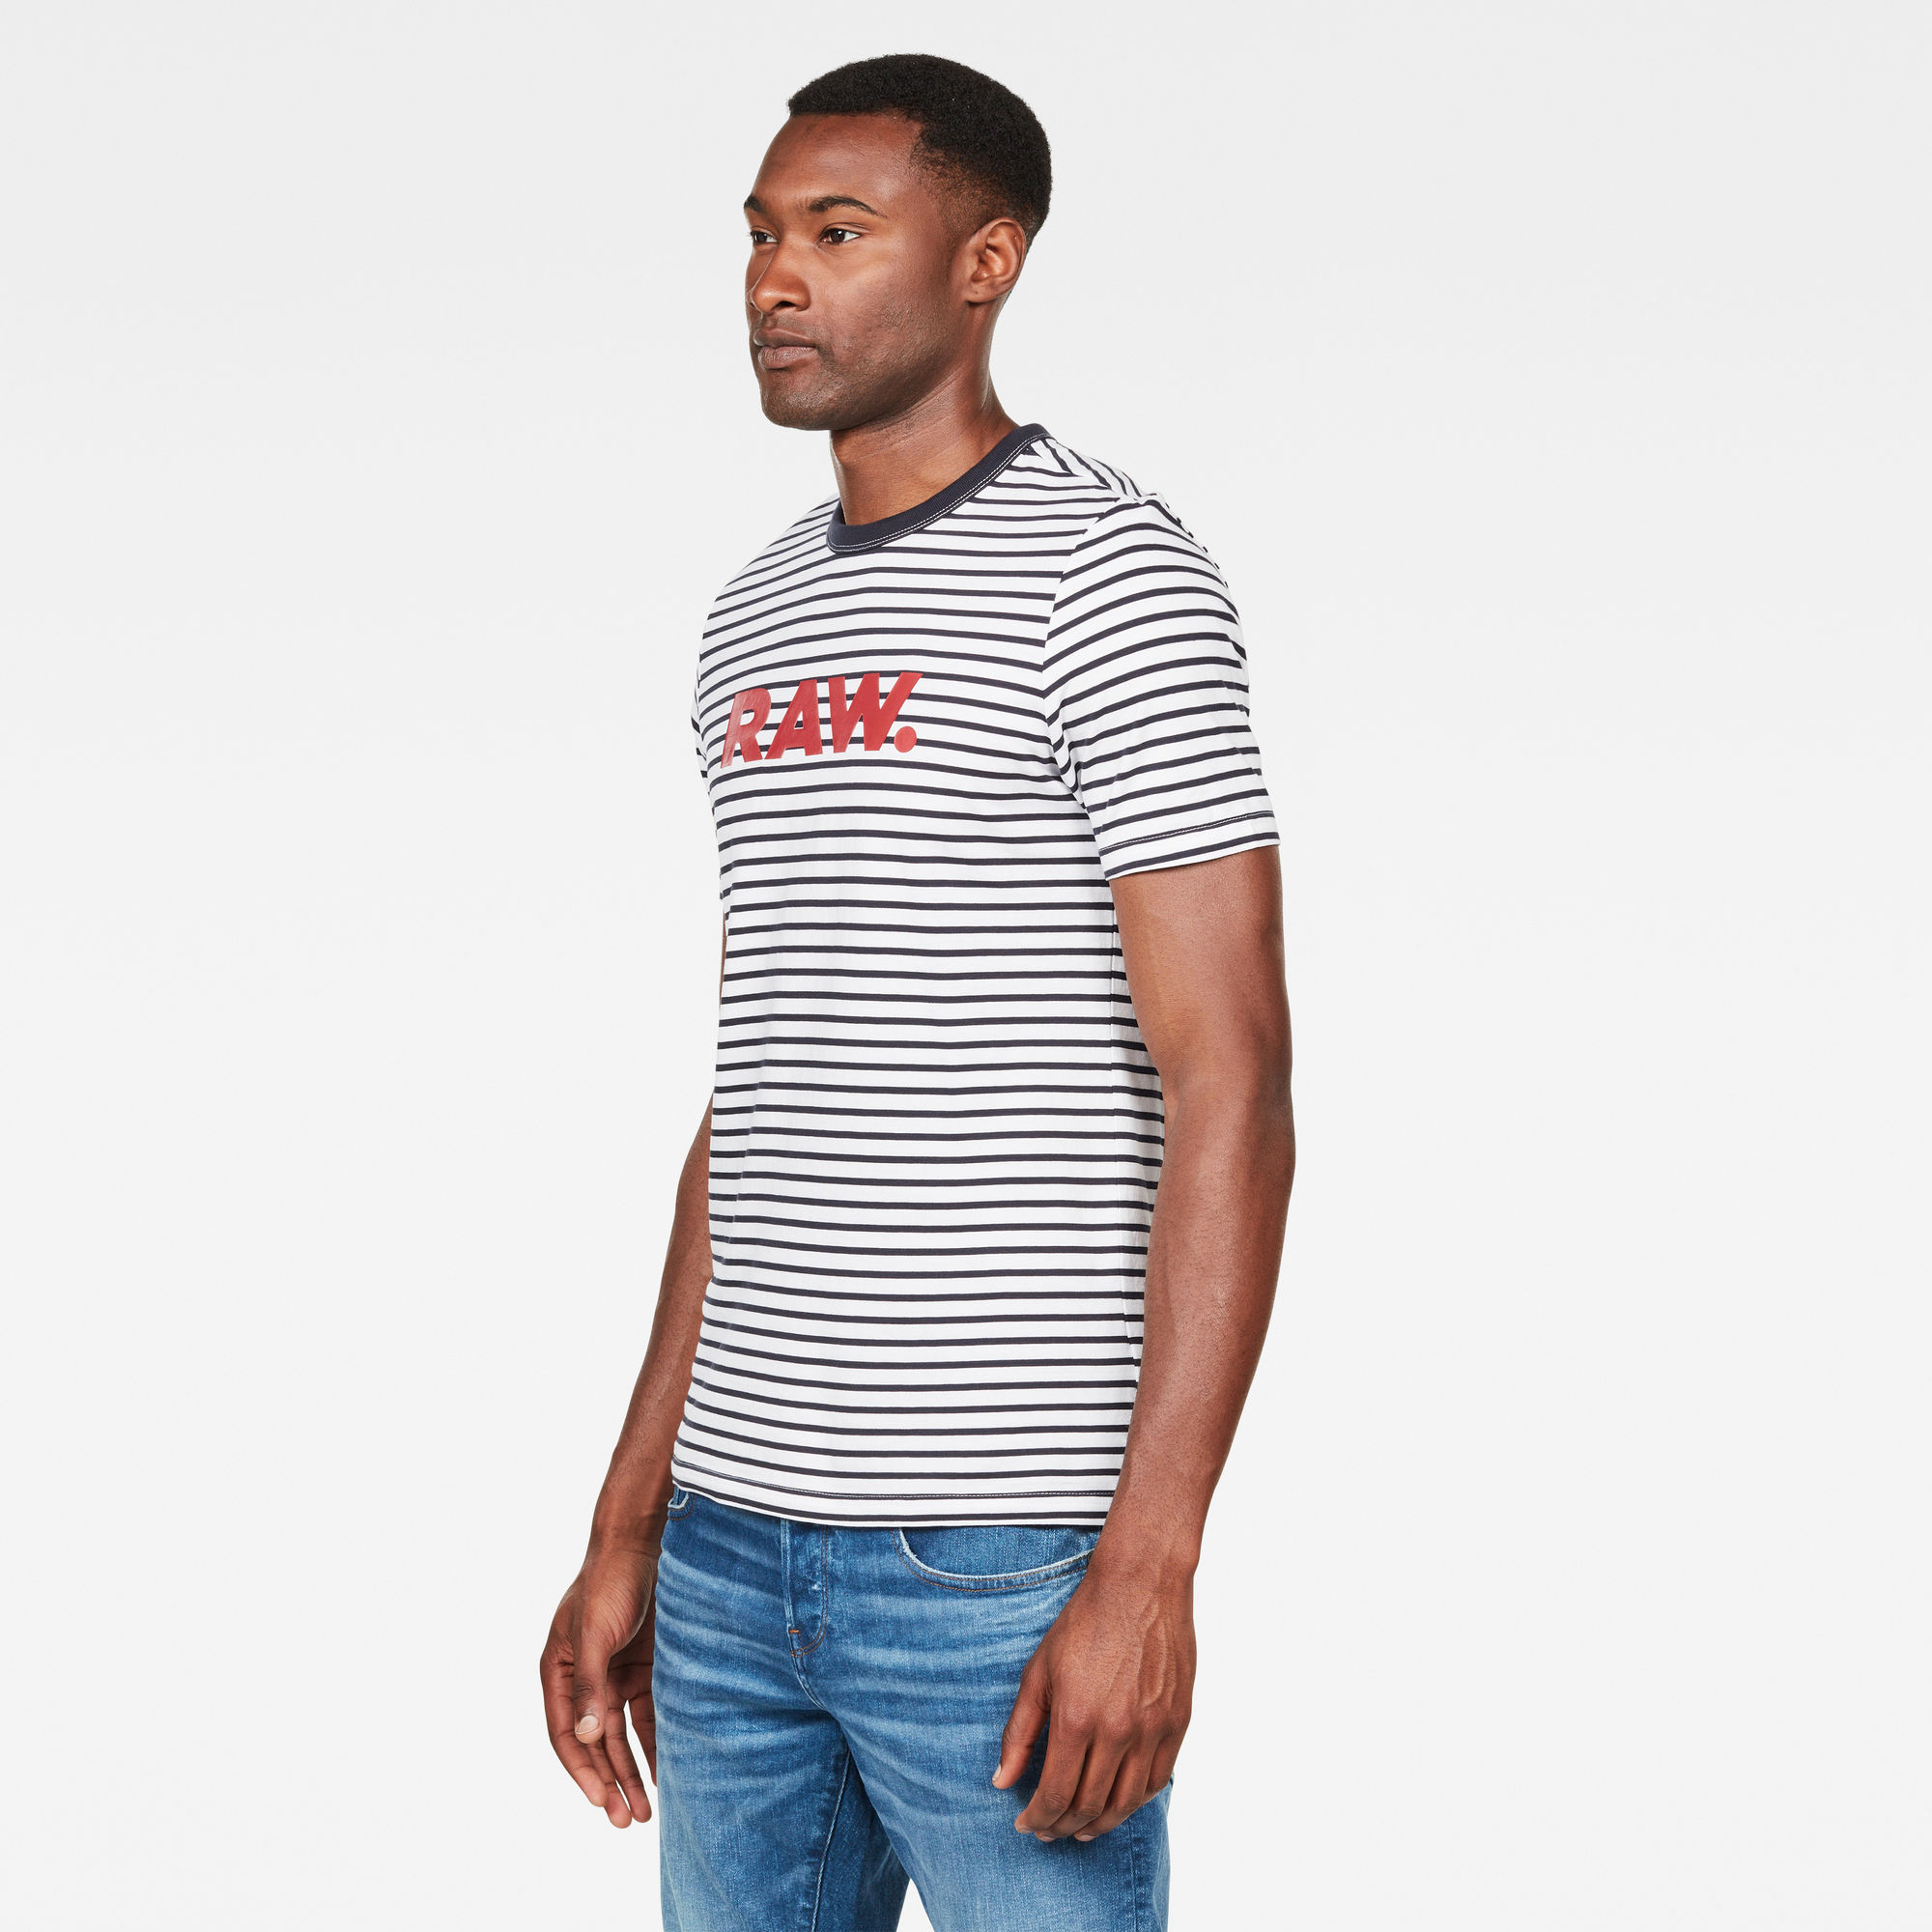 G-Star RAW Resistor T-Shirt